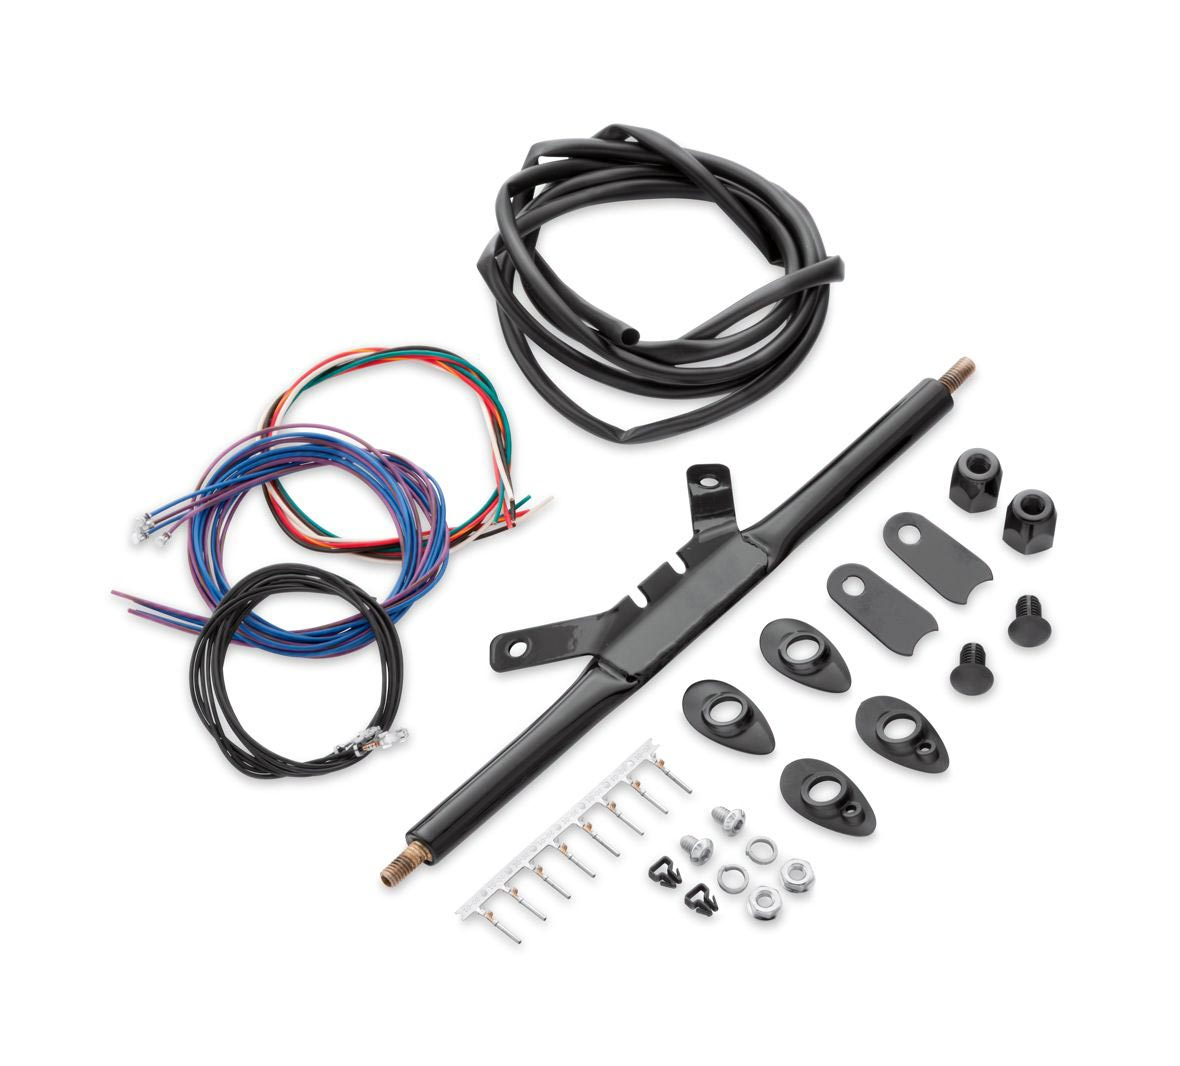 Turn Signal Relocation Kit At Thunderbike Shop